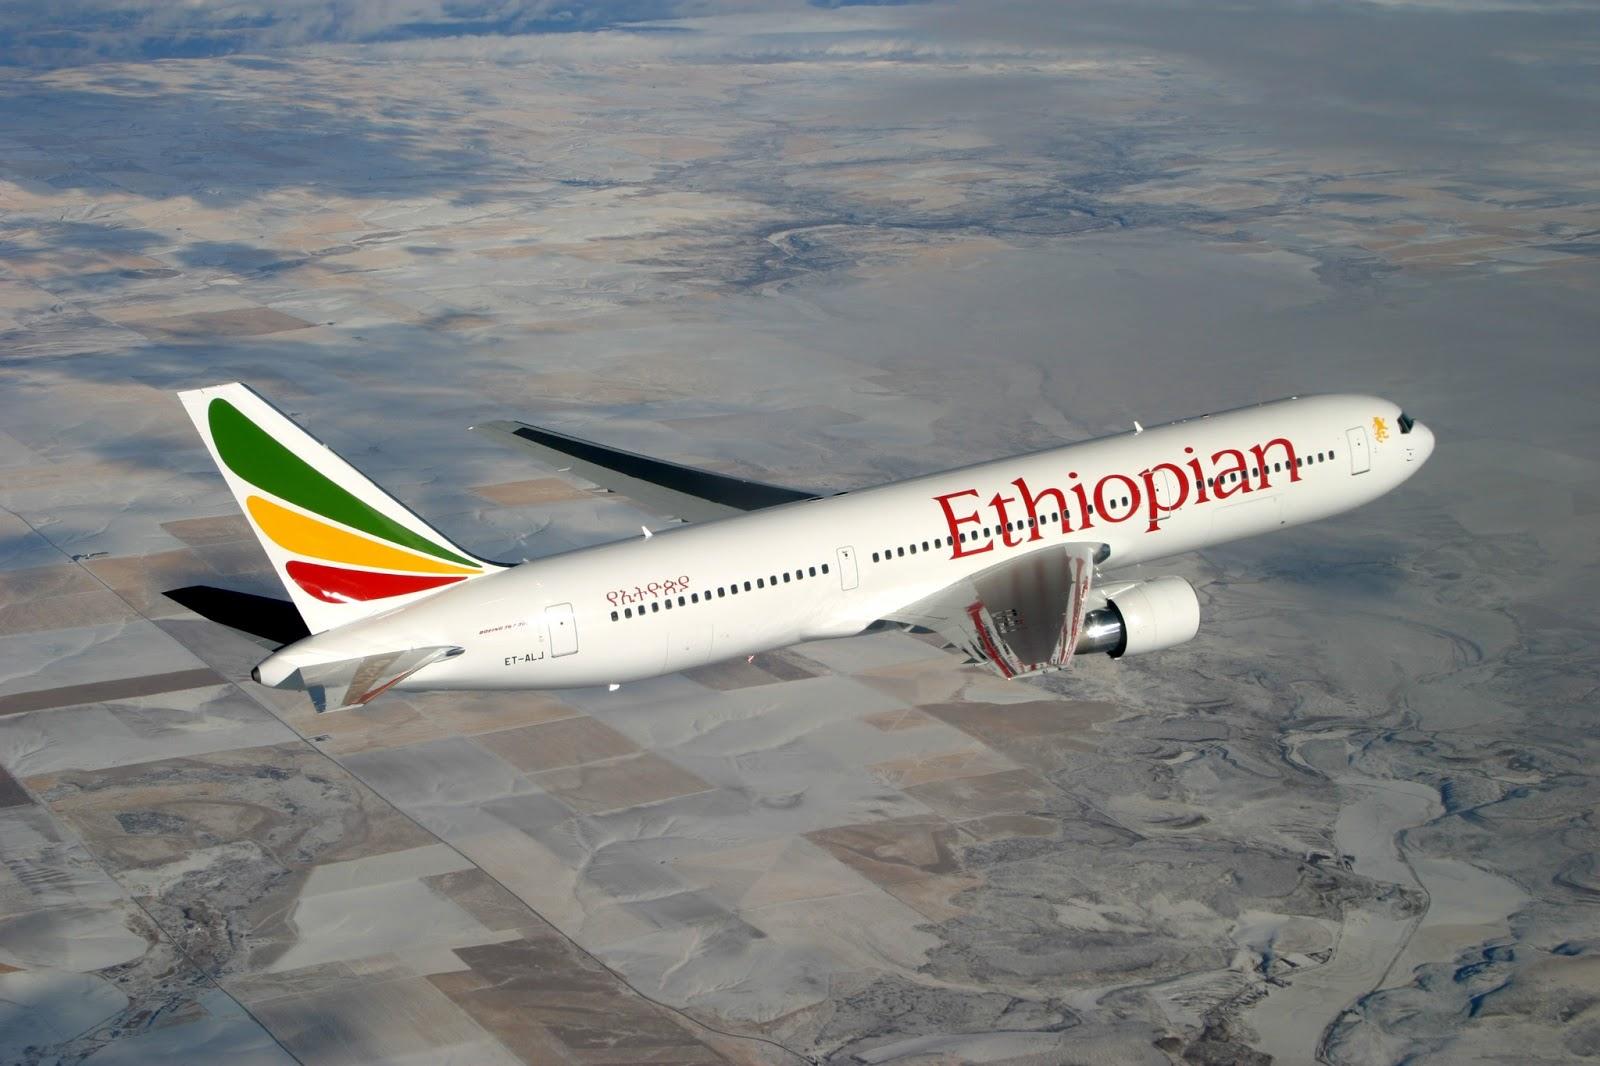 Impact of passenger services in ethiopian